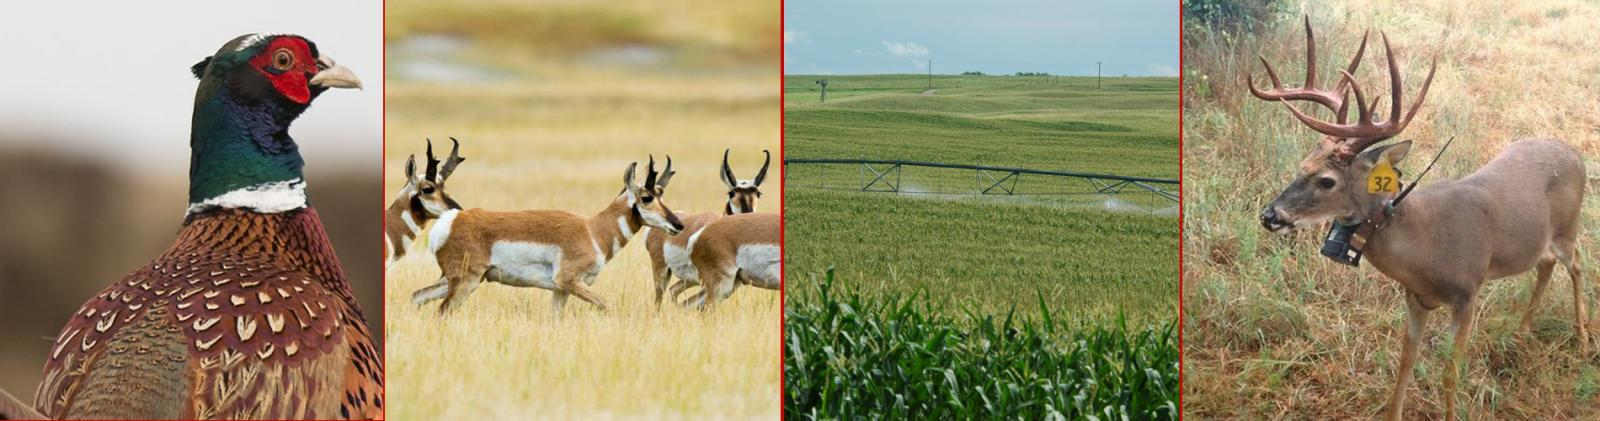 Pheasant, Pronghorn,Irrigated Corn, Deer